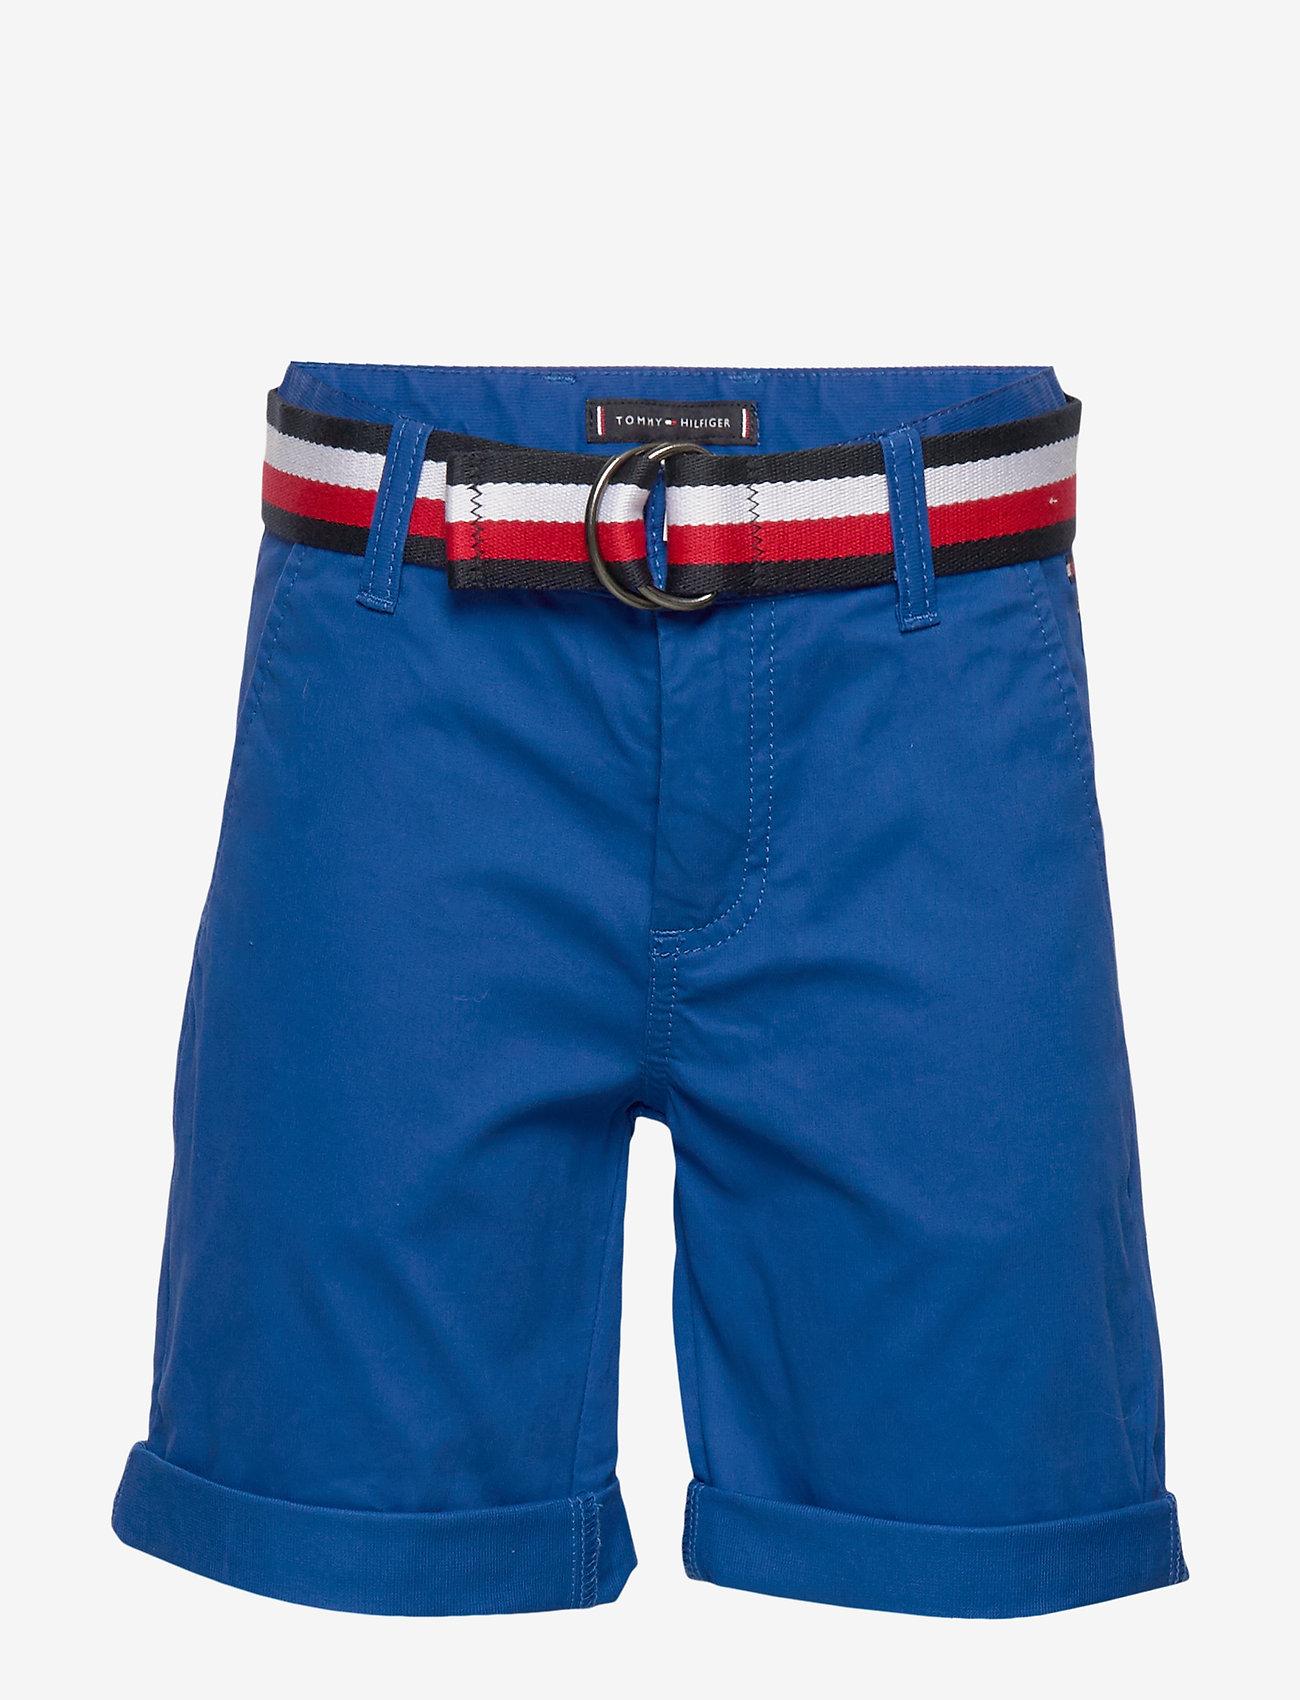 Tommy Hilfiger - ESSENTIAL BELTED CHI - shorts - lapis lazuli - 0